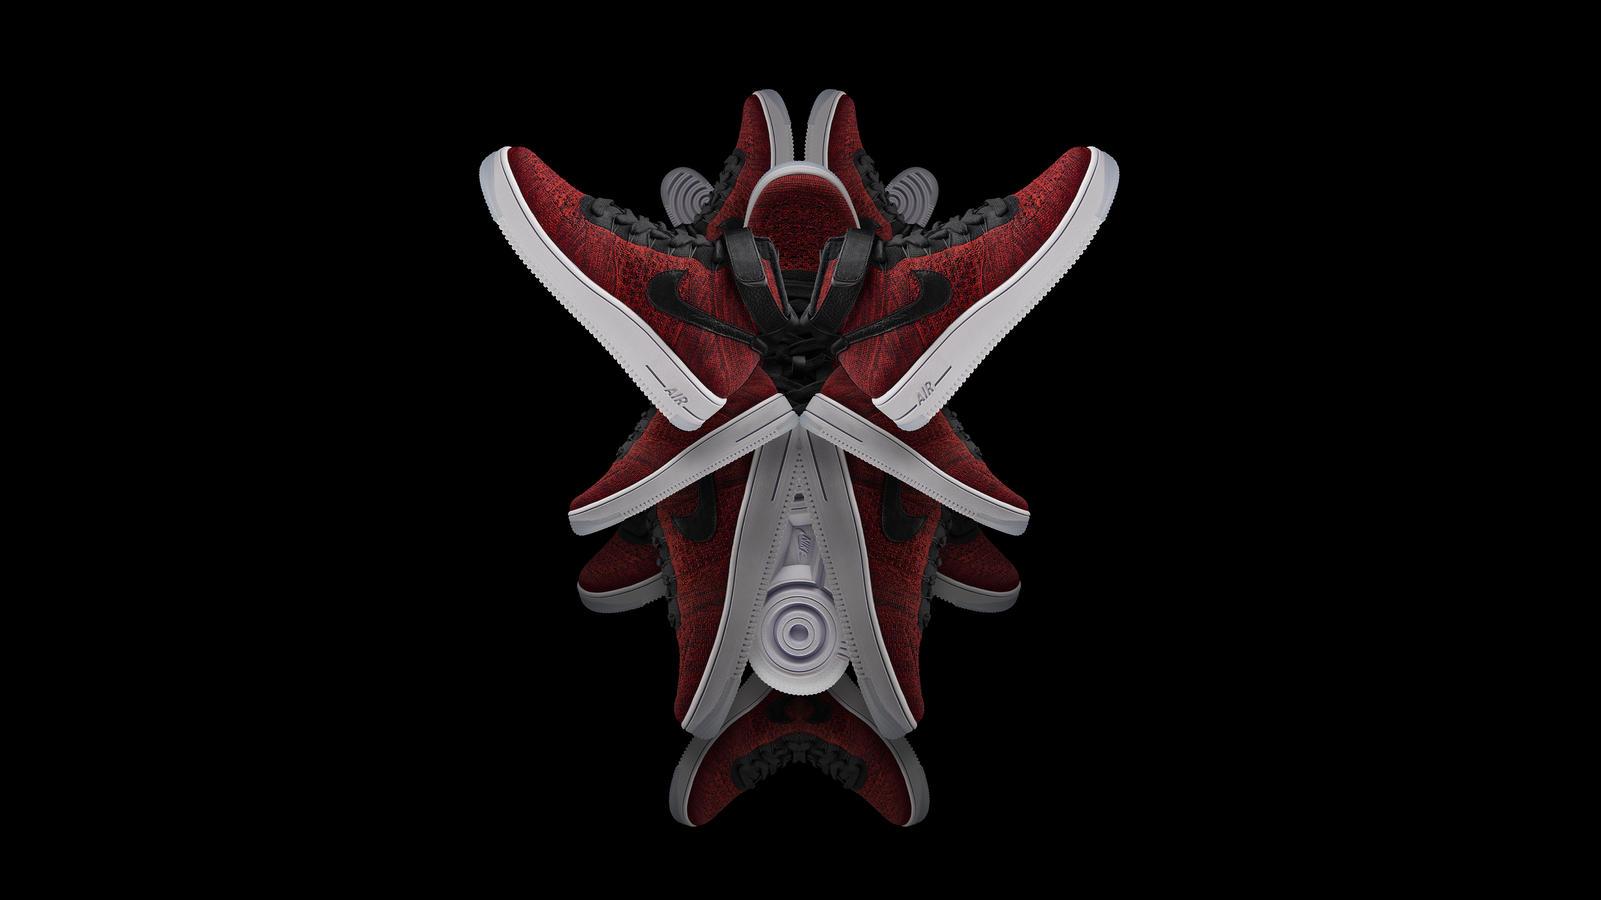 AF1_Flyknit_Red_wide_hd_1600